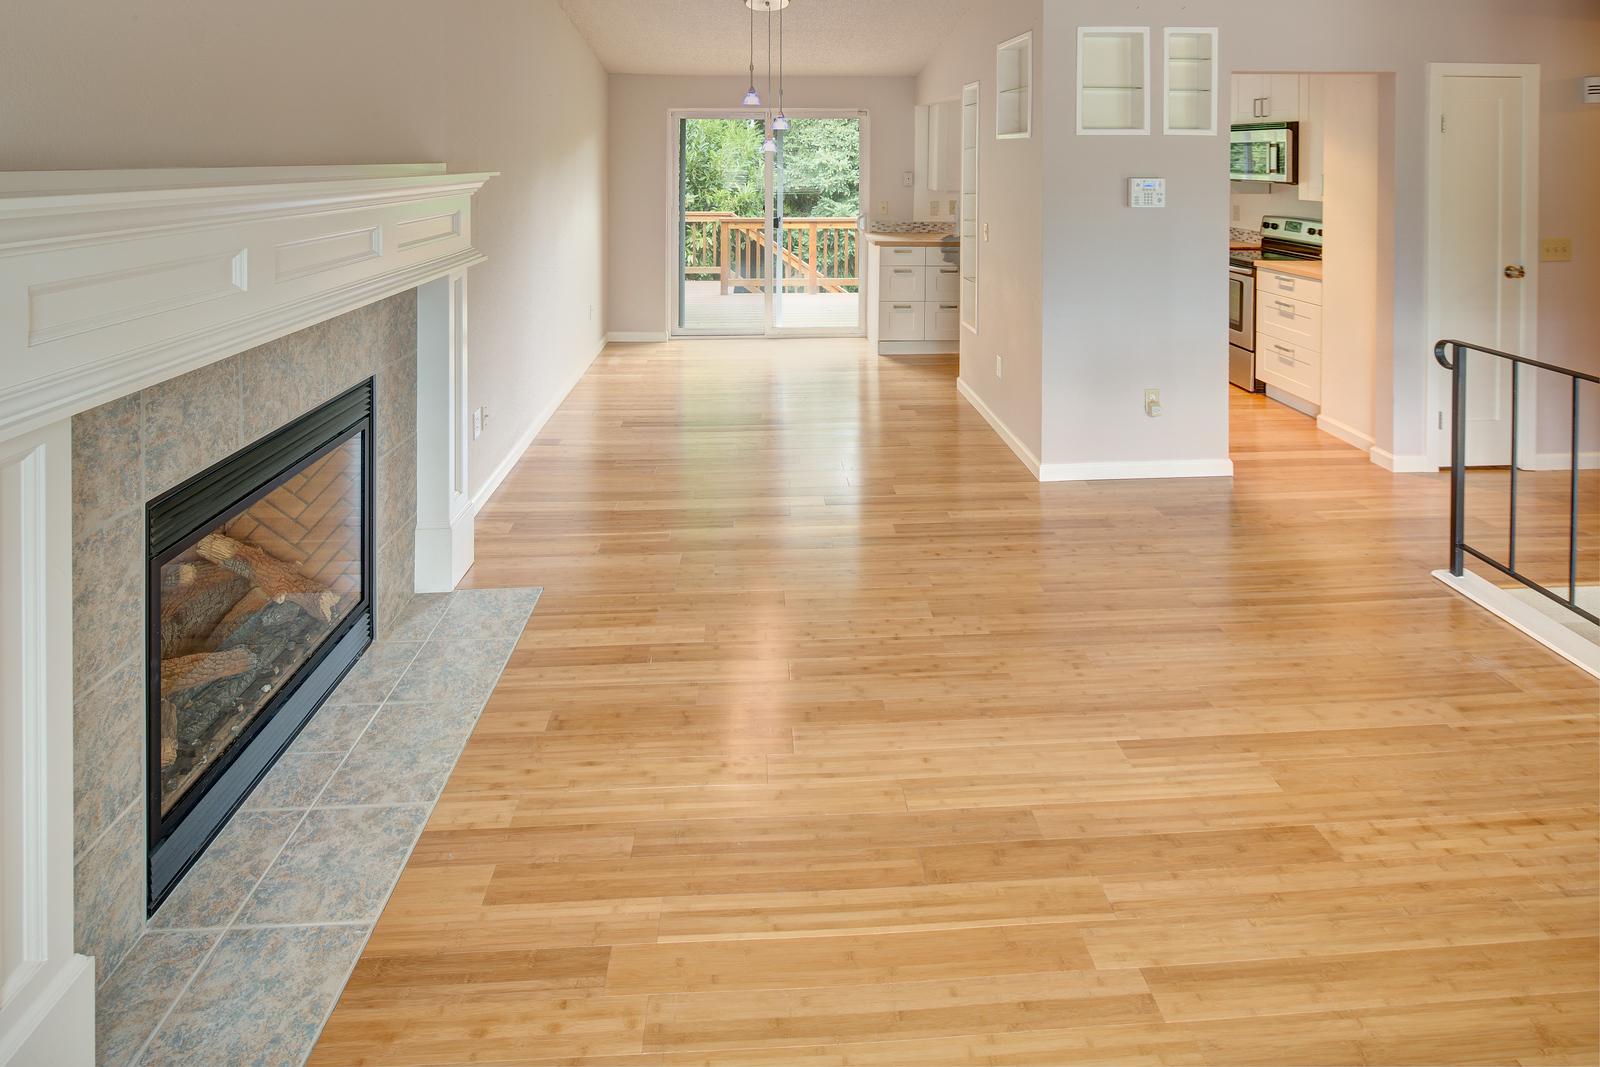 Real Estate Photography on July 19, 2016 at 2001 181st St SE in Bothell WA, USA.  Photo credit: Jason Tanaka